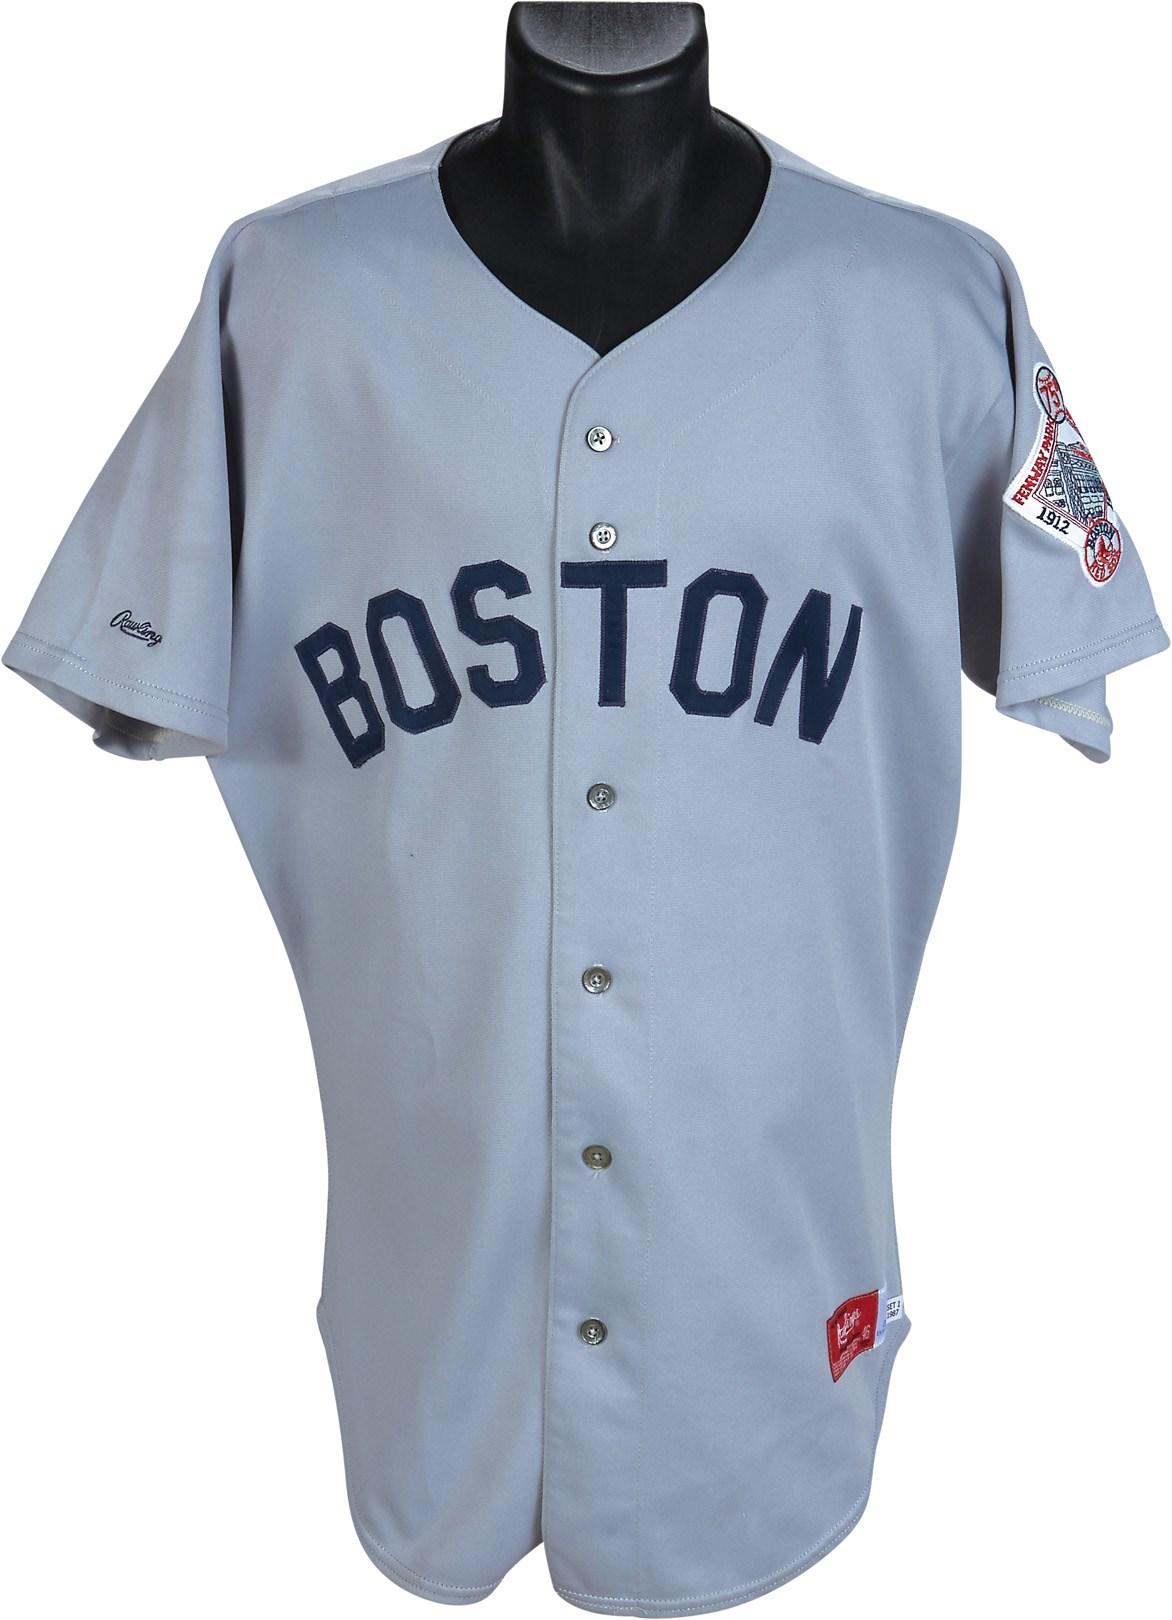 Boston Sports - Leland's Classic